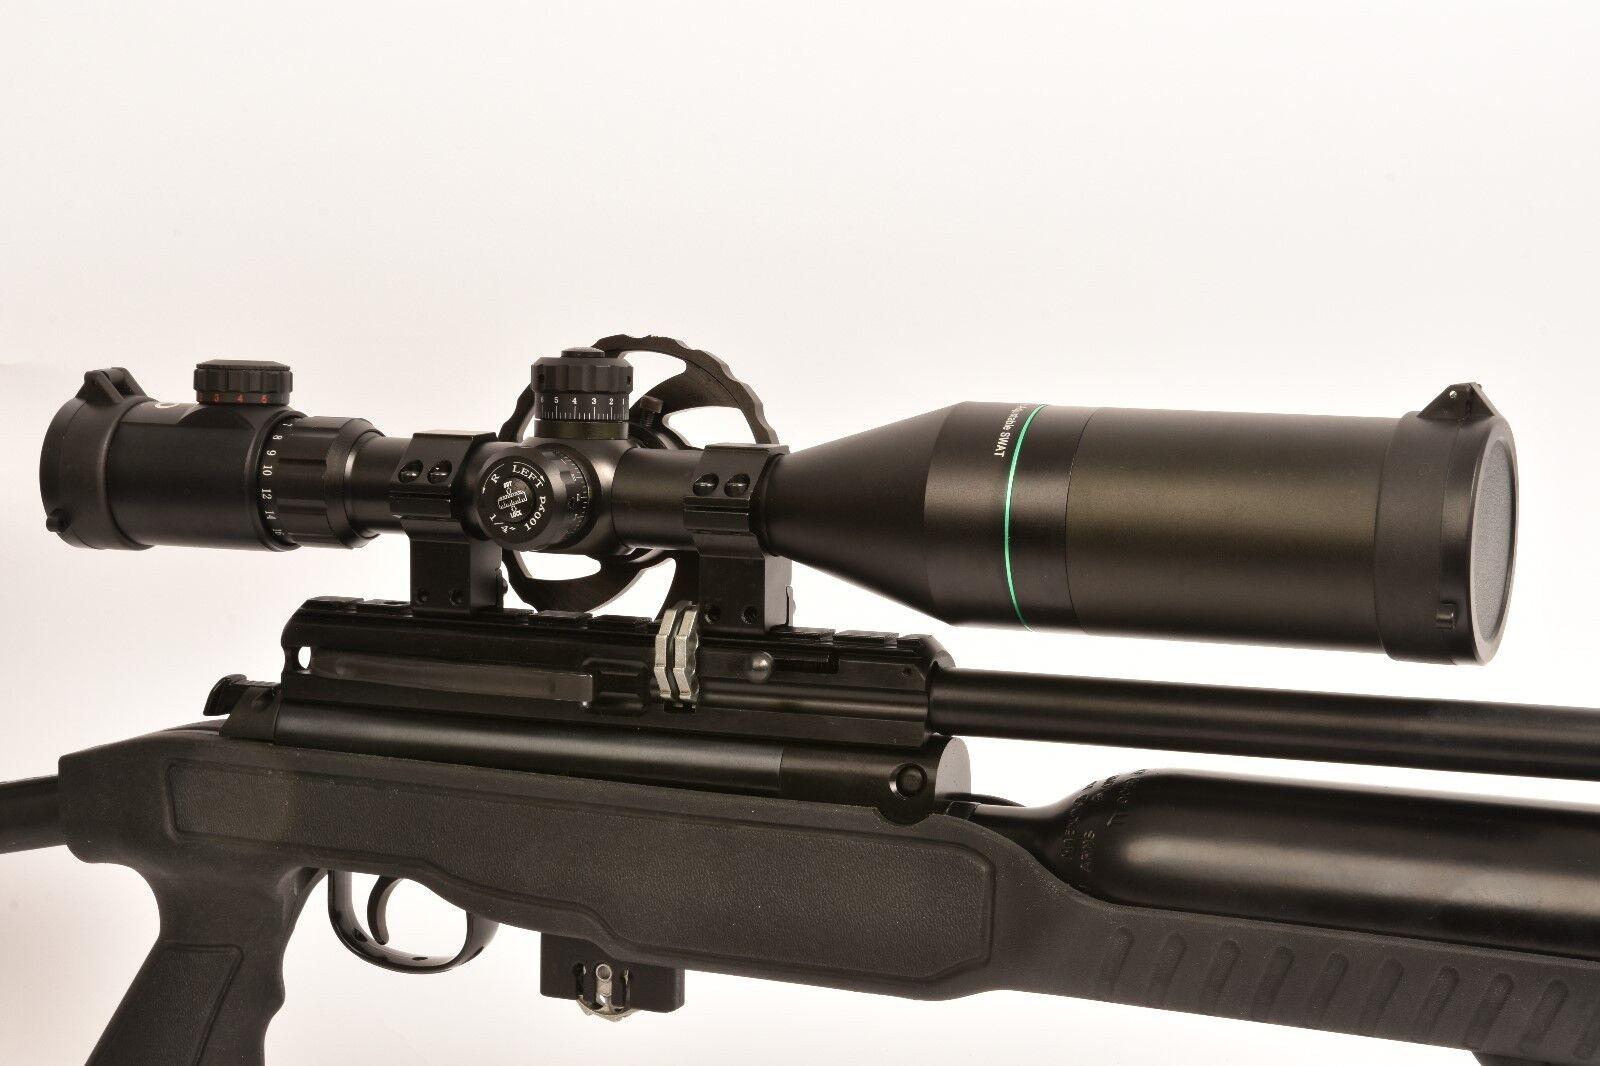 Pao ® – Esmeralda Mil-Dot 6-24 X 56 ir pa compacto  SWAT  rifle Alcance + Lente Cubre